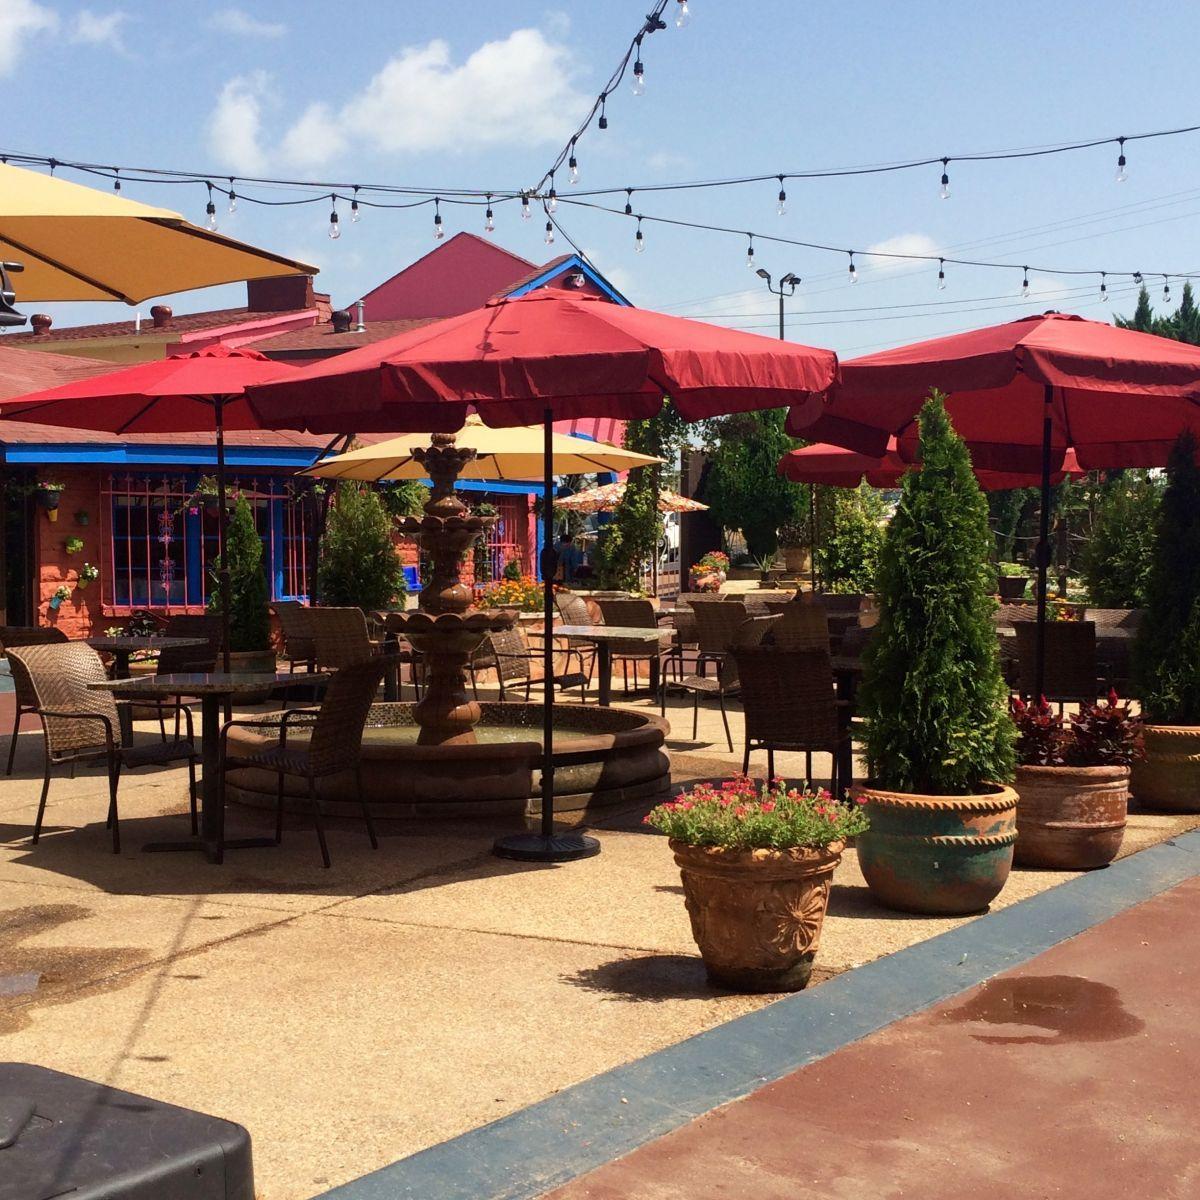 Campestre Chula Vista - Mexican Brunch & Margaritas Fort Worth